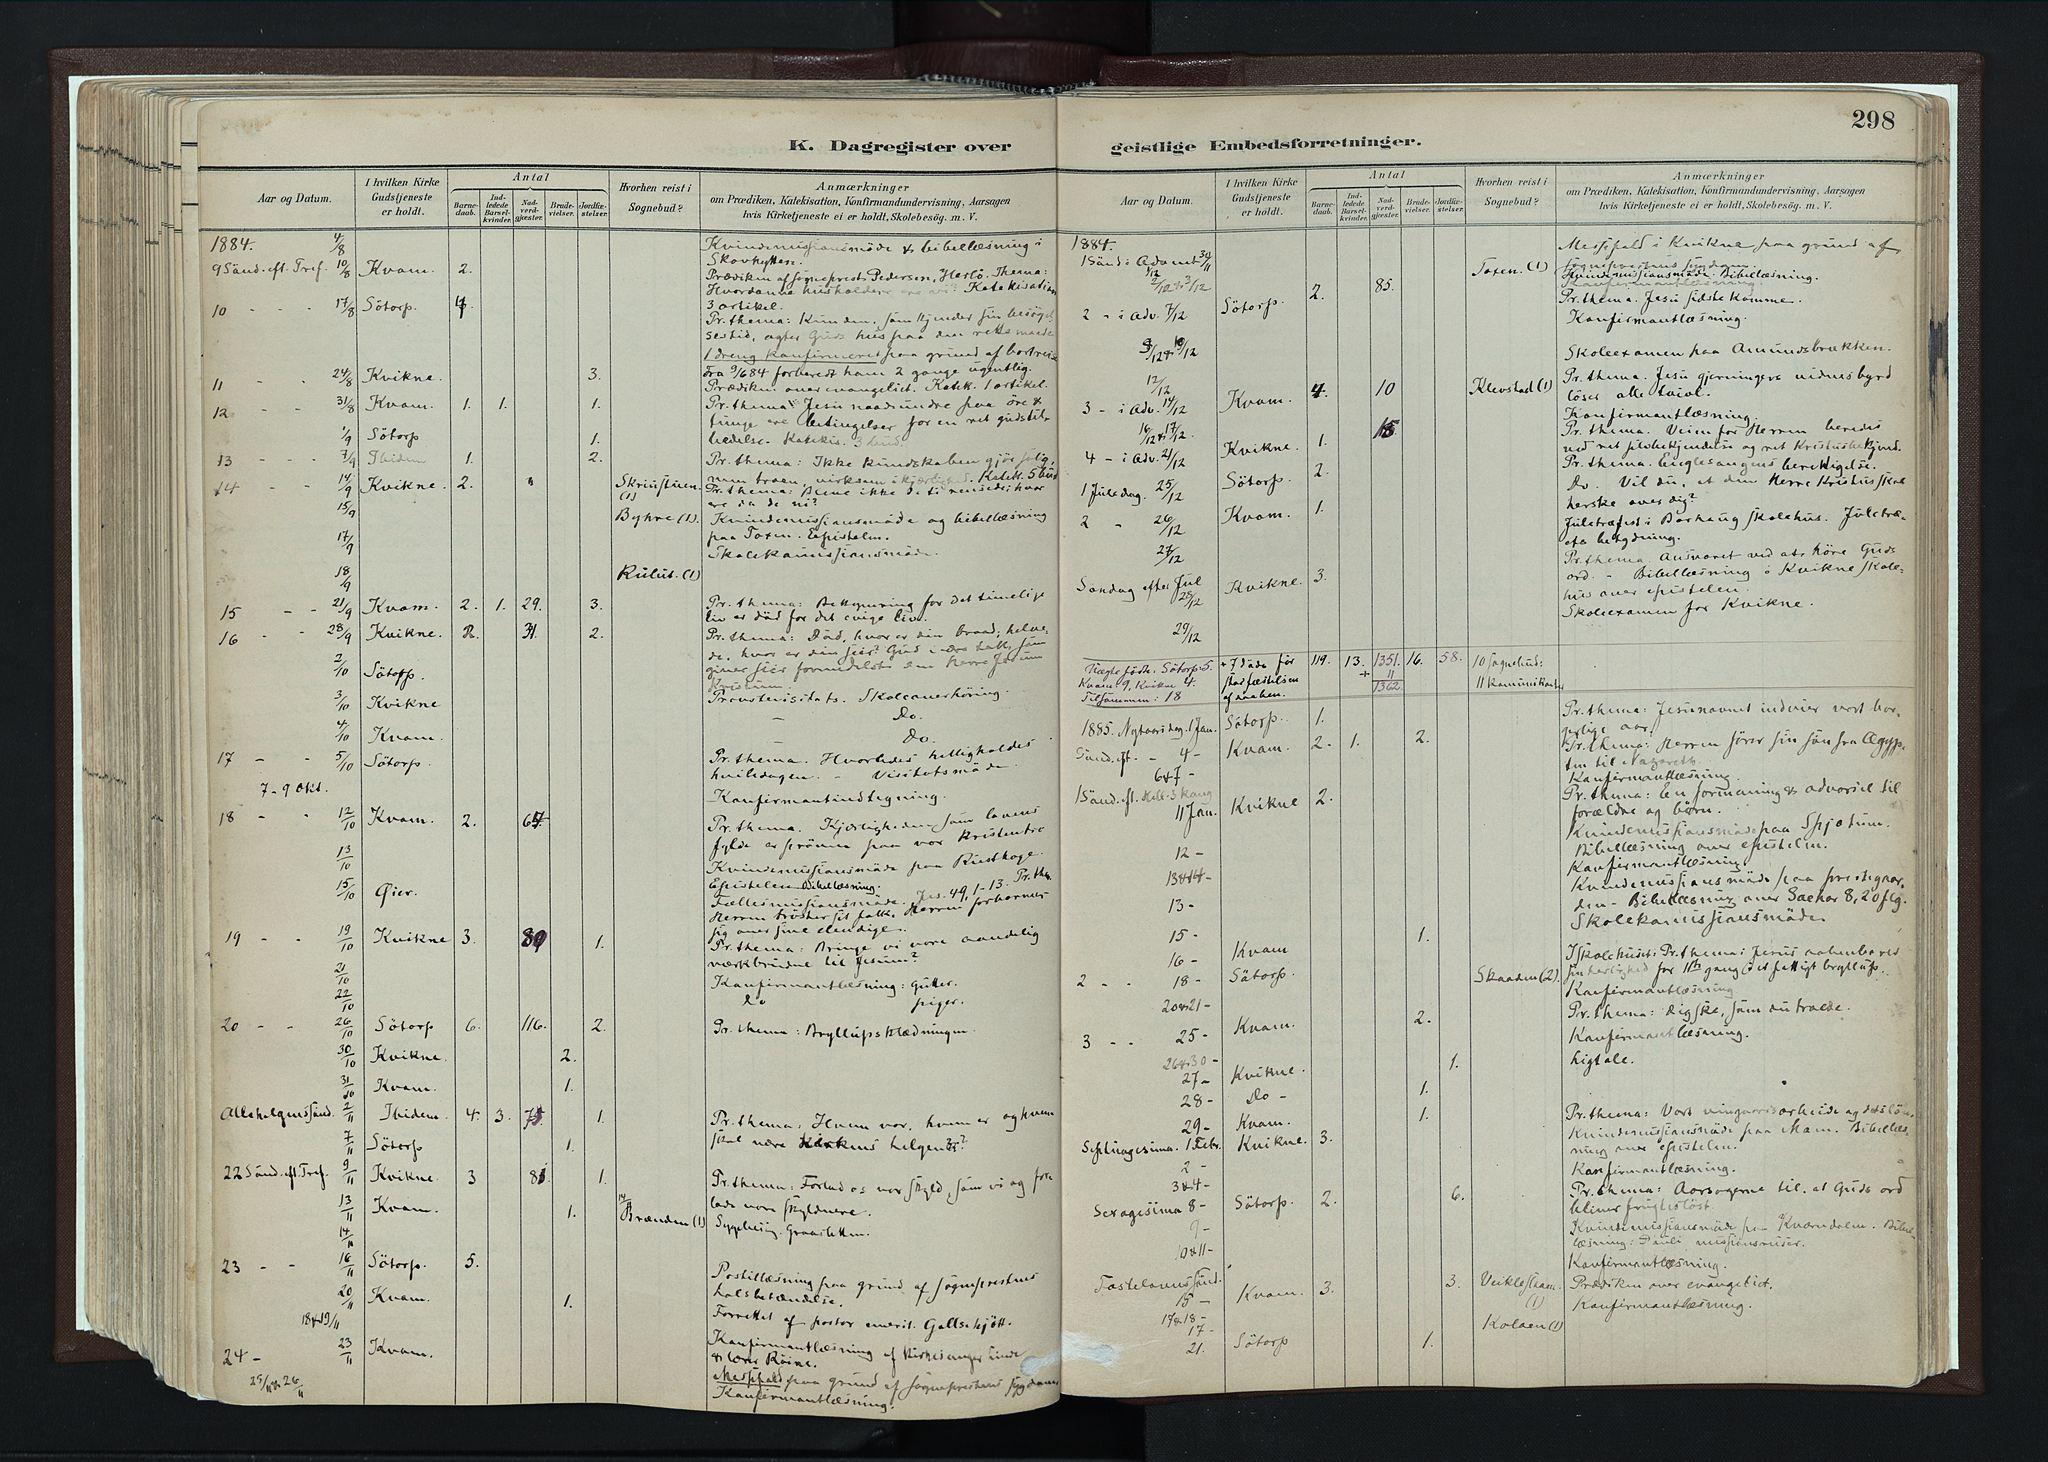 SAH, Nord-Fron prestekontor, Ministerialbok nr. 4, 1884-1914, s. 298